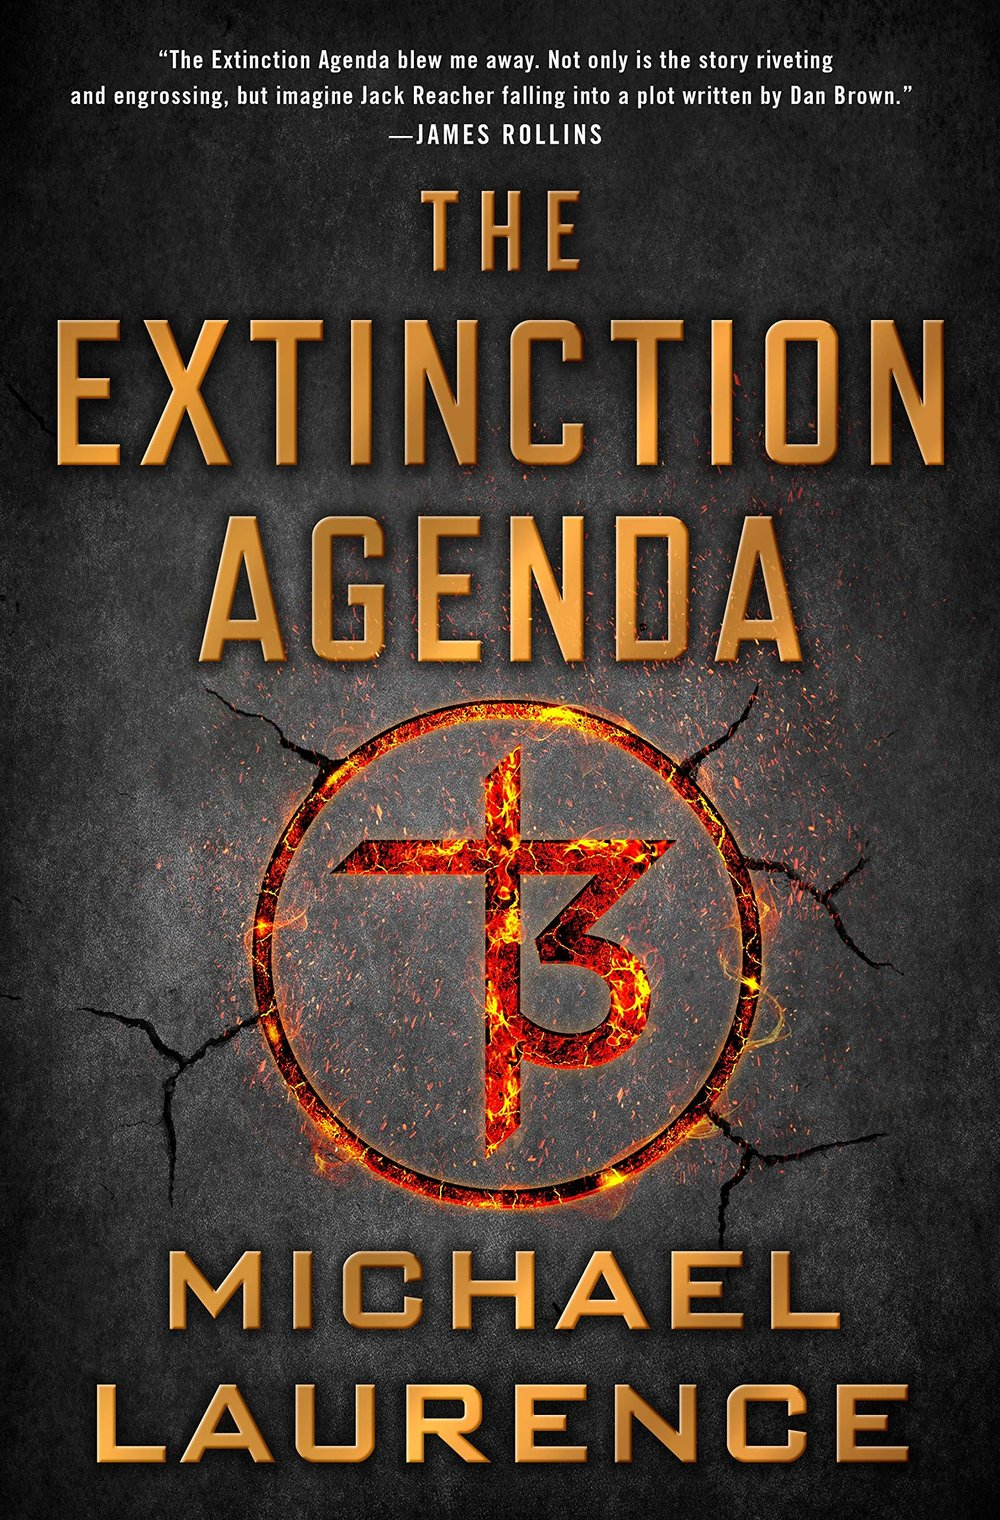 The Extinction Agenda_Michael Laurence.jpg